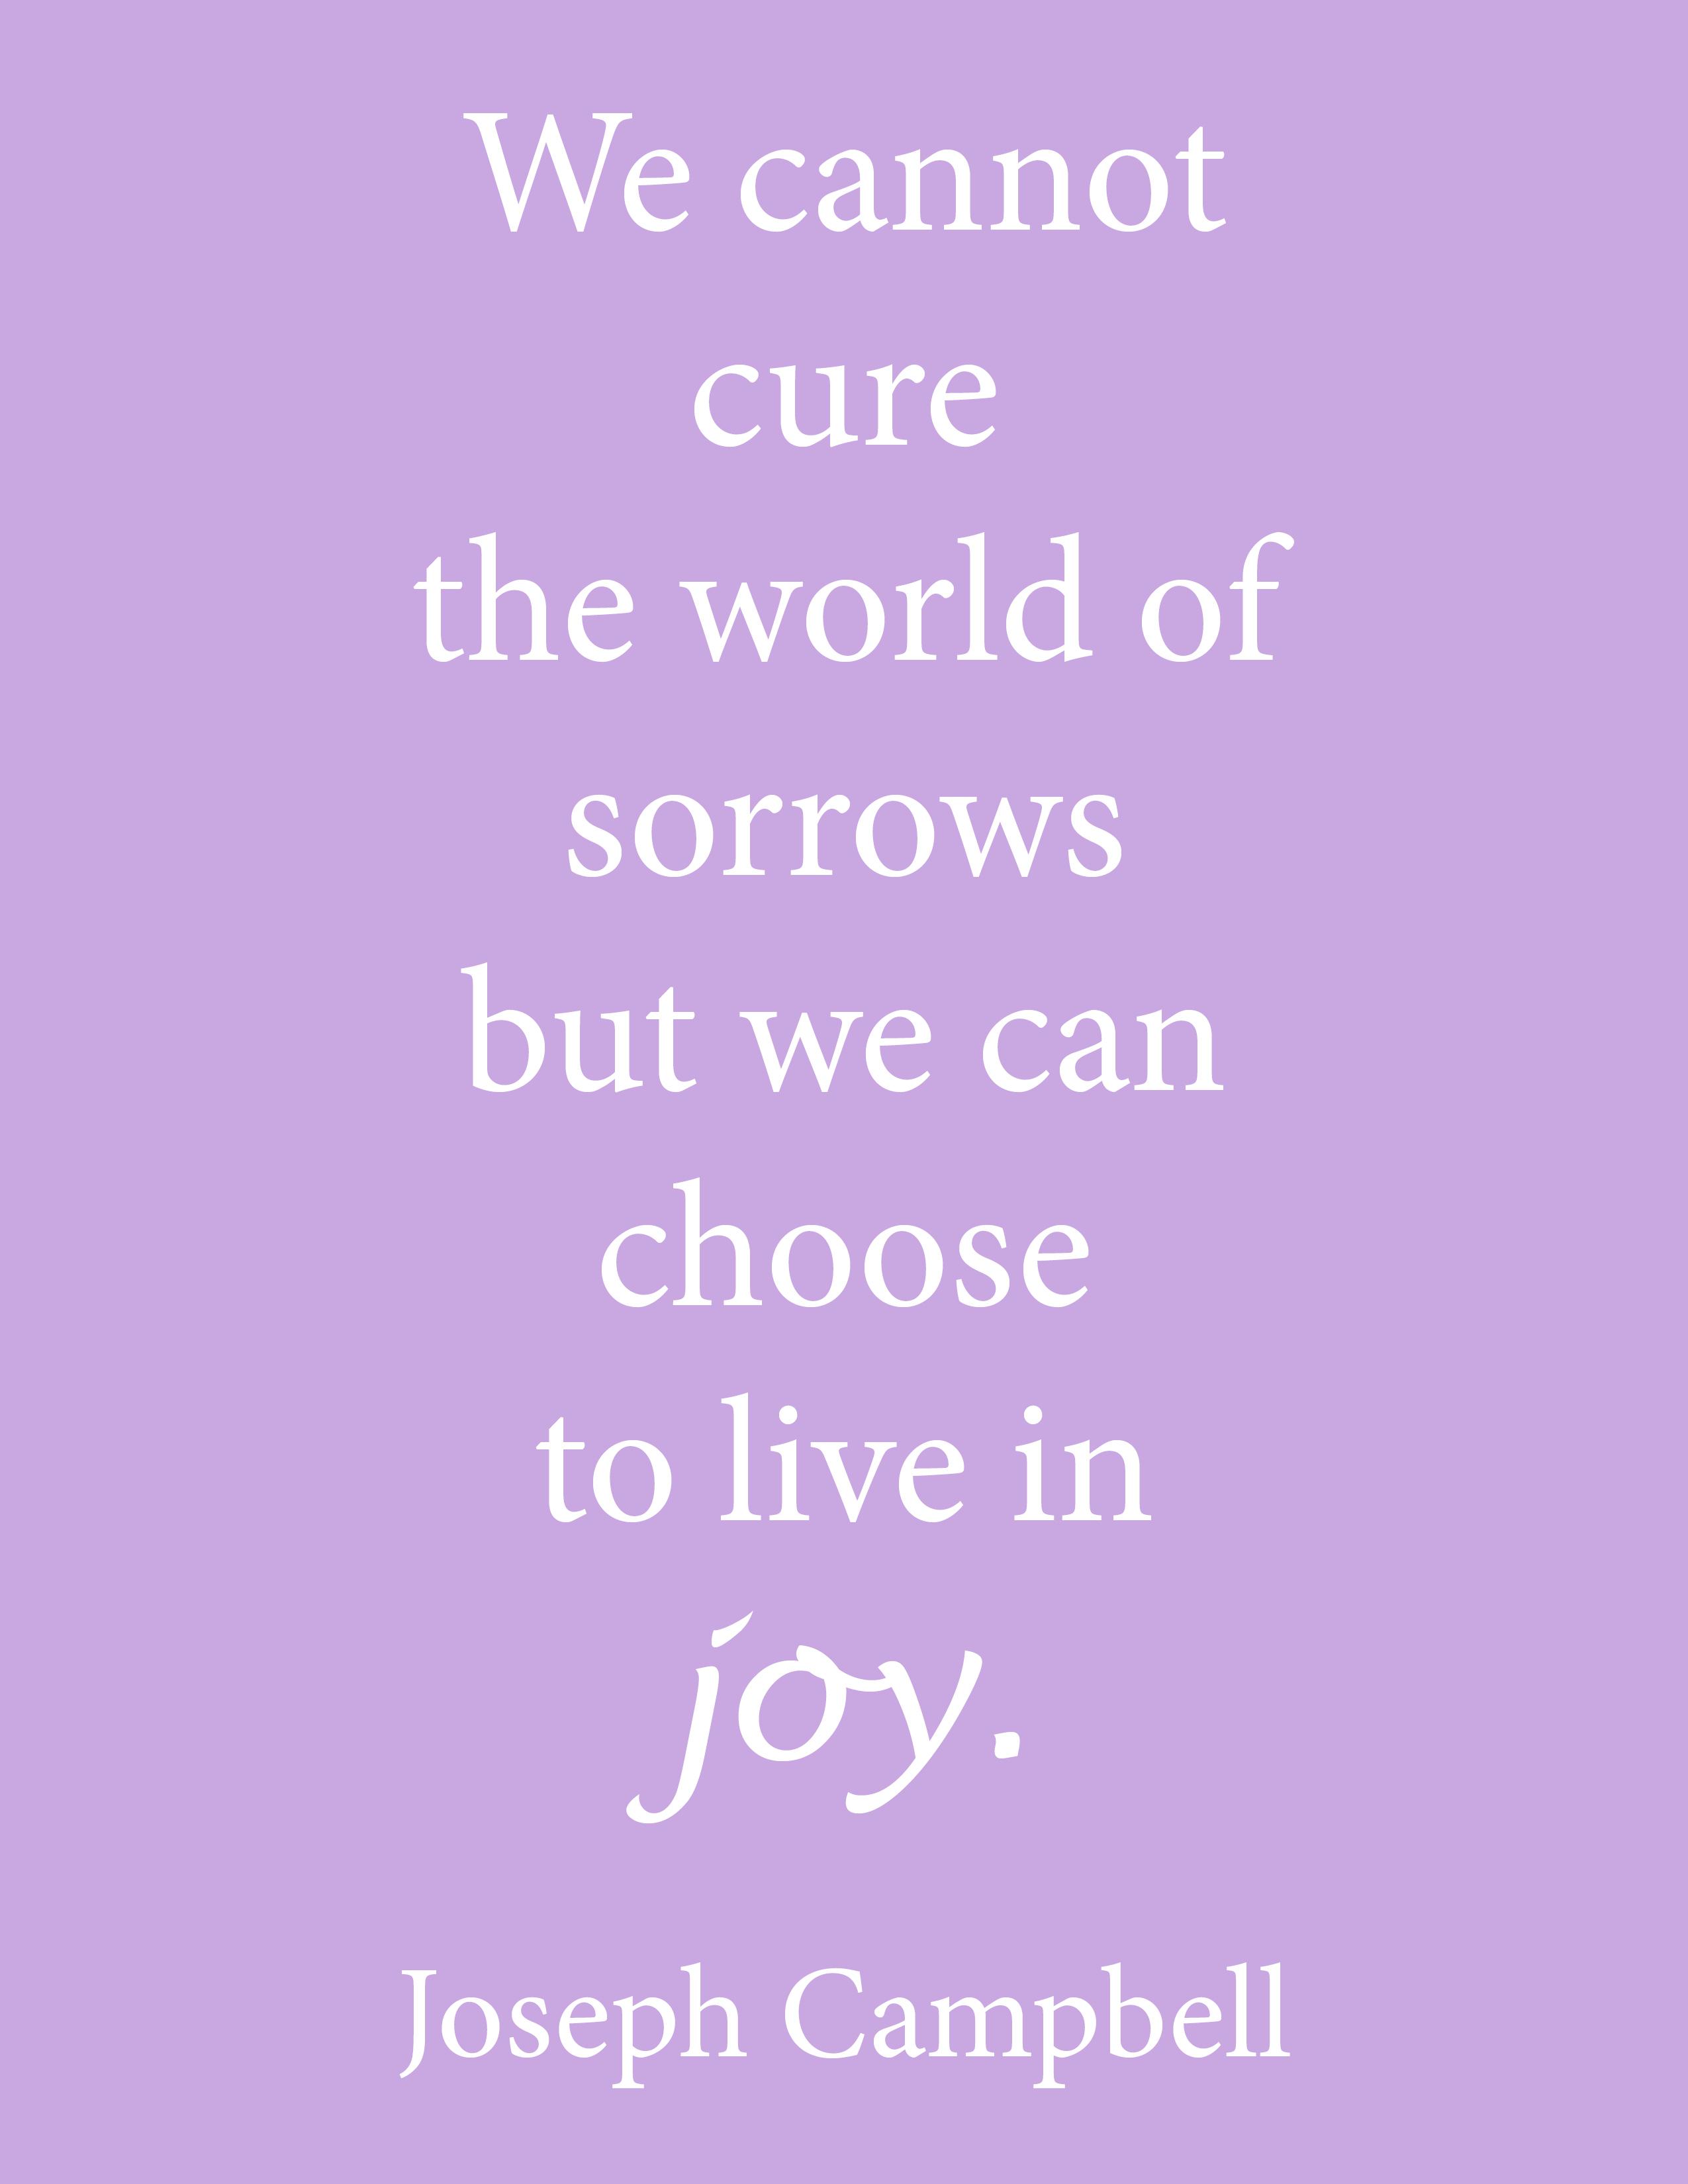 Joseph Campbell's quote #5